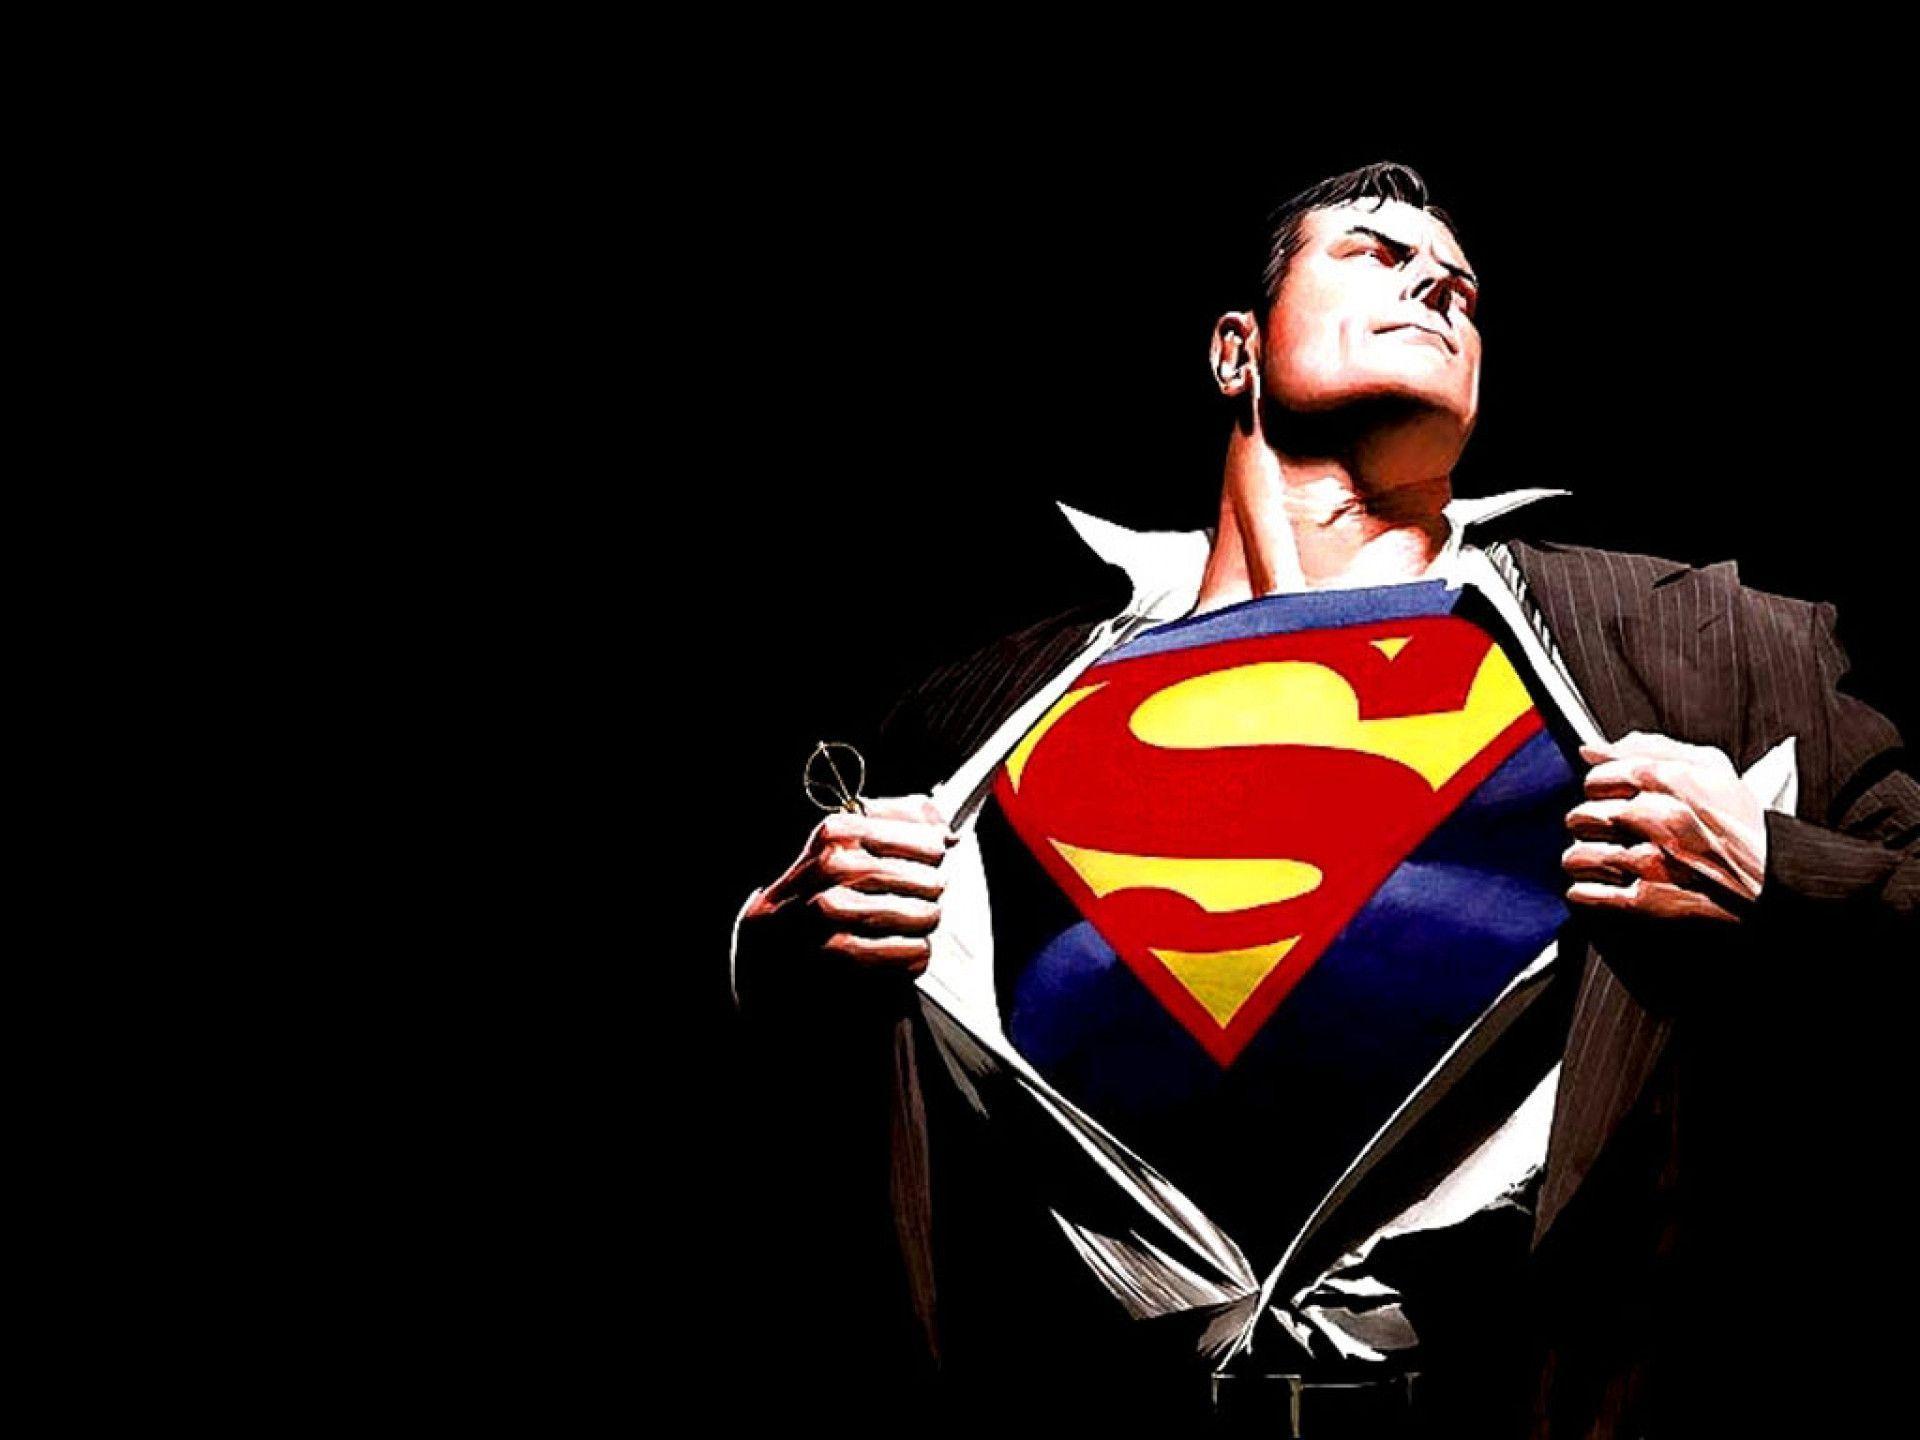 superman wallpapers p wallpaper 1920×1440 superman image